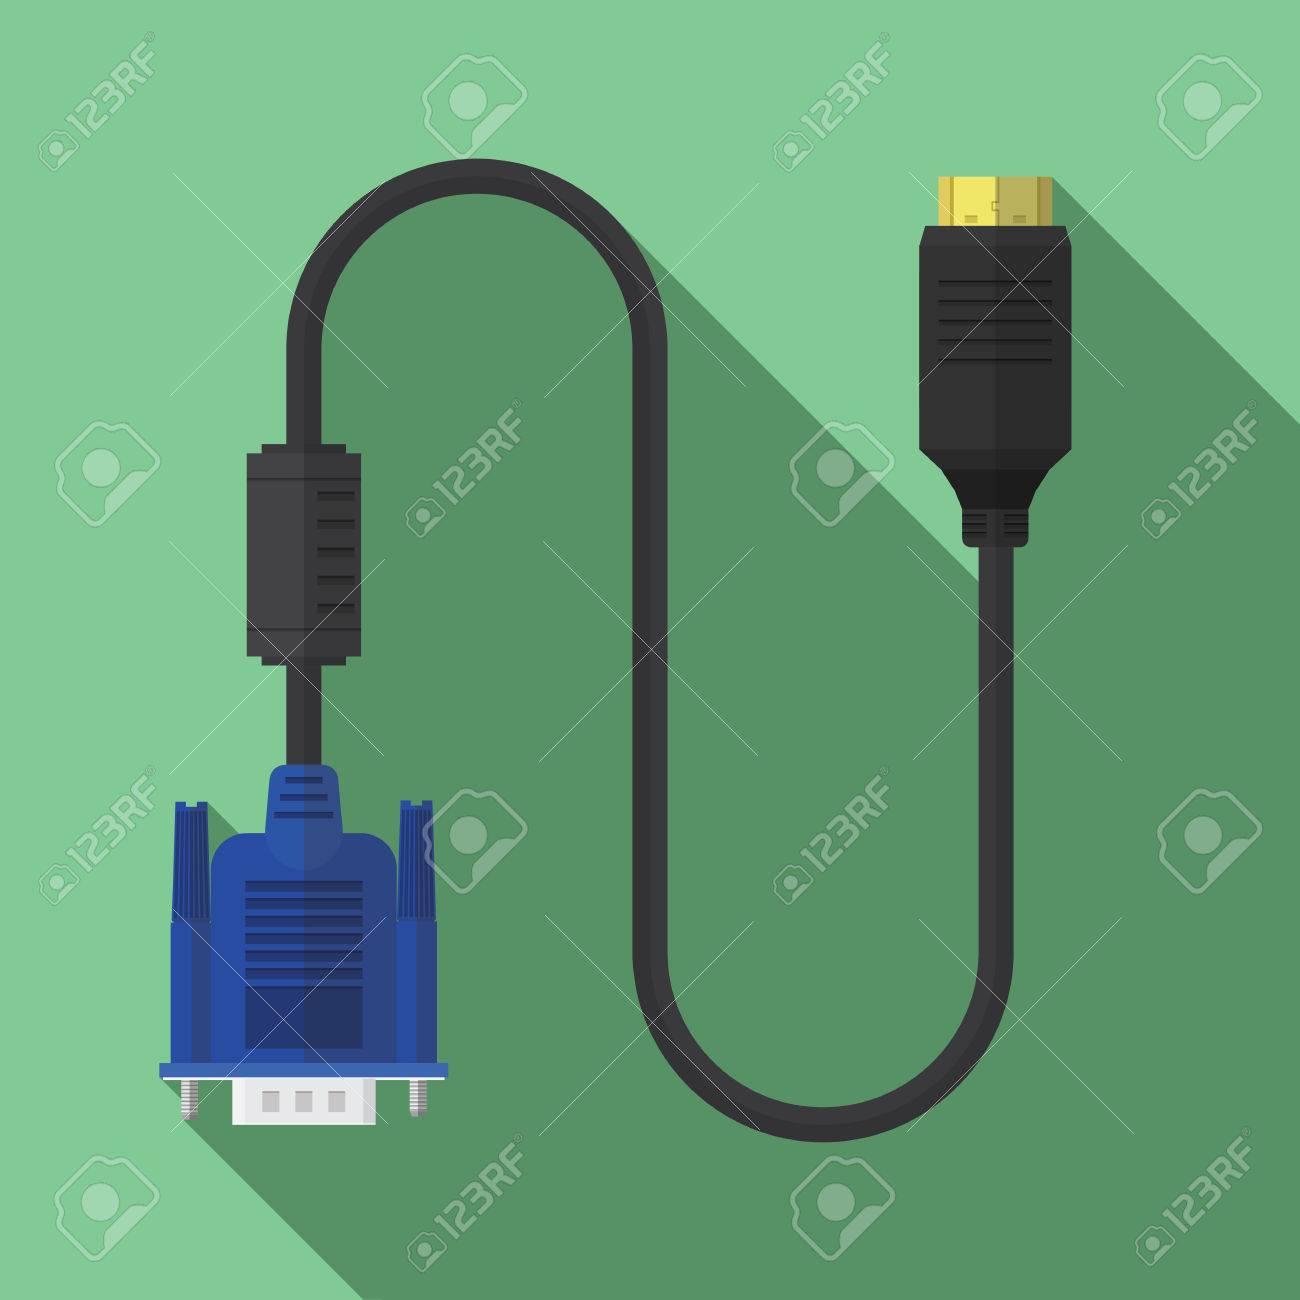 Vga to hdmi cable icon